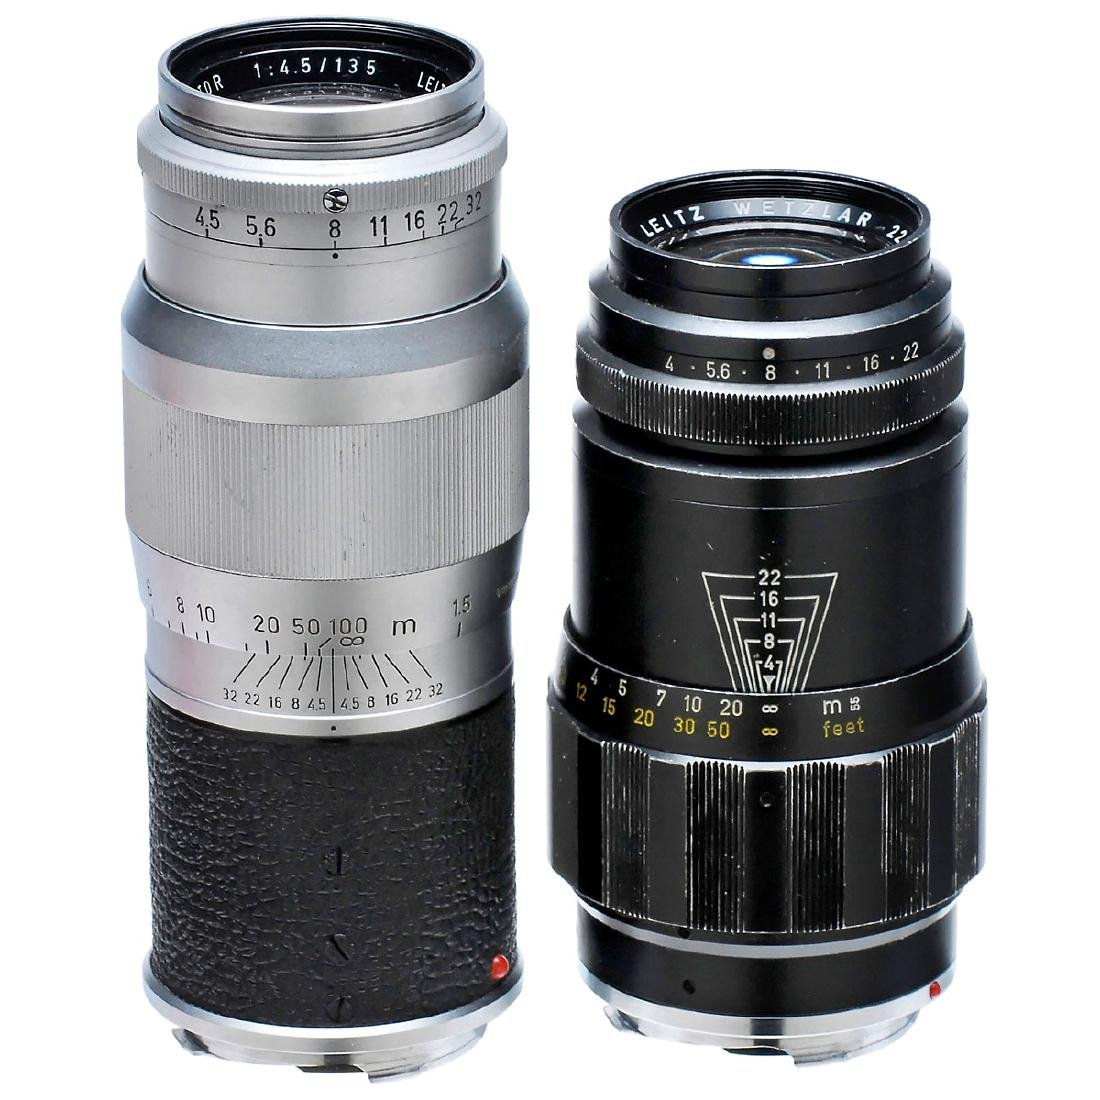 Tele-Elmar 4/135 mm and Hektor 4,5/135 mm